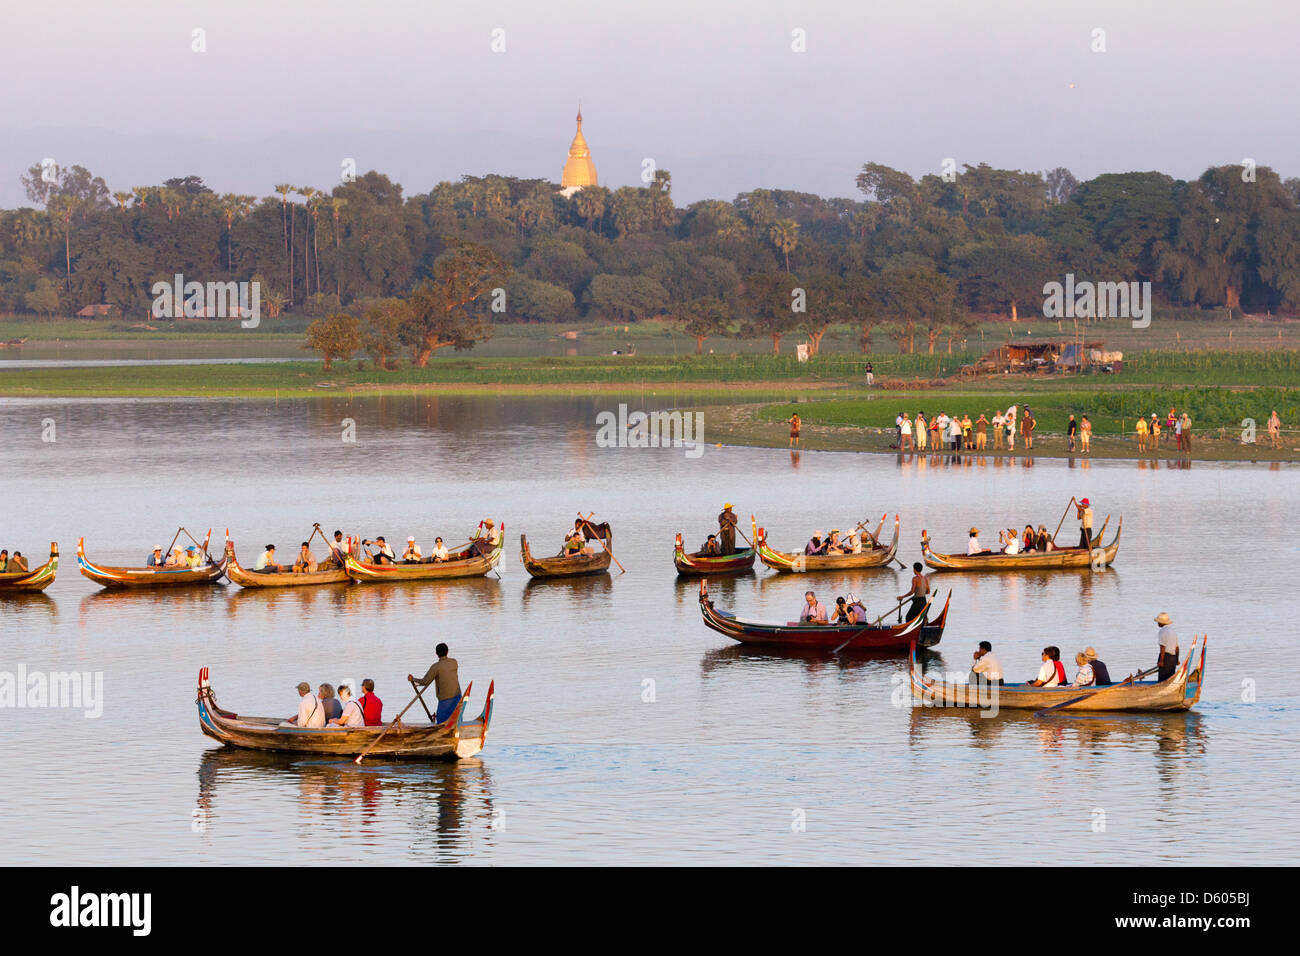 Tourist boats lining up on Taungthaman Lake, Myanmar, to view sunset over U Bein Teak Bridge 2 Stock Photo